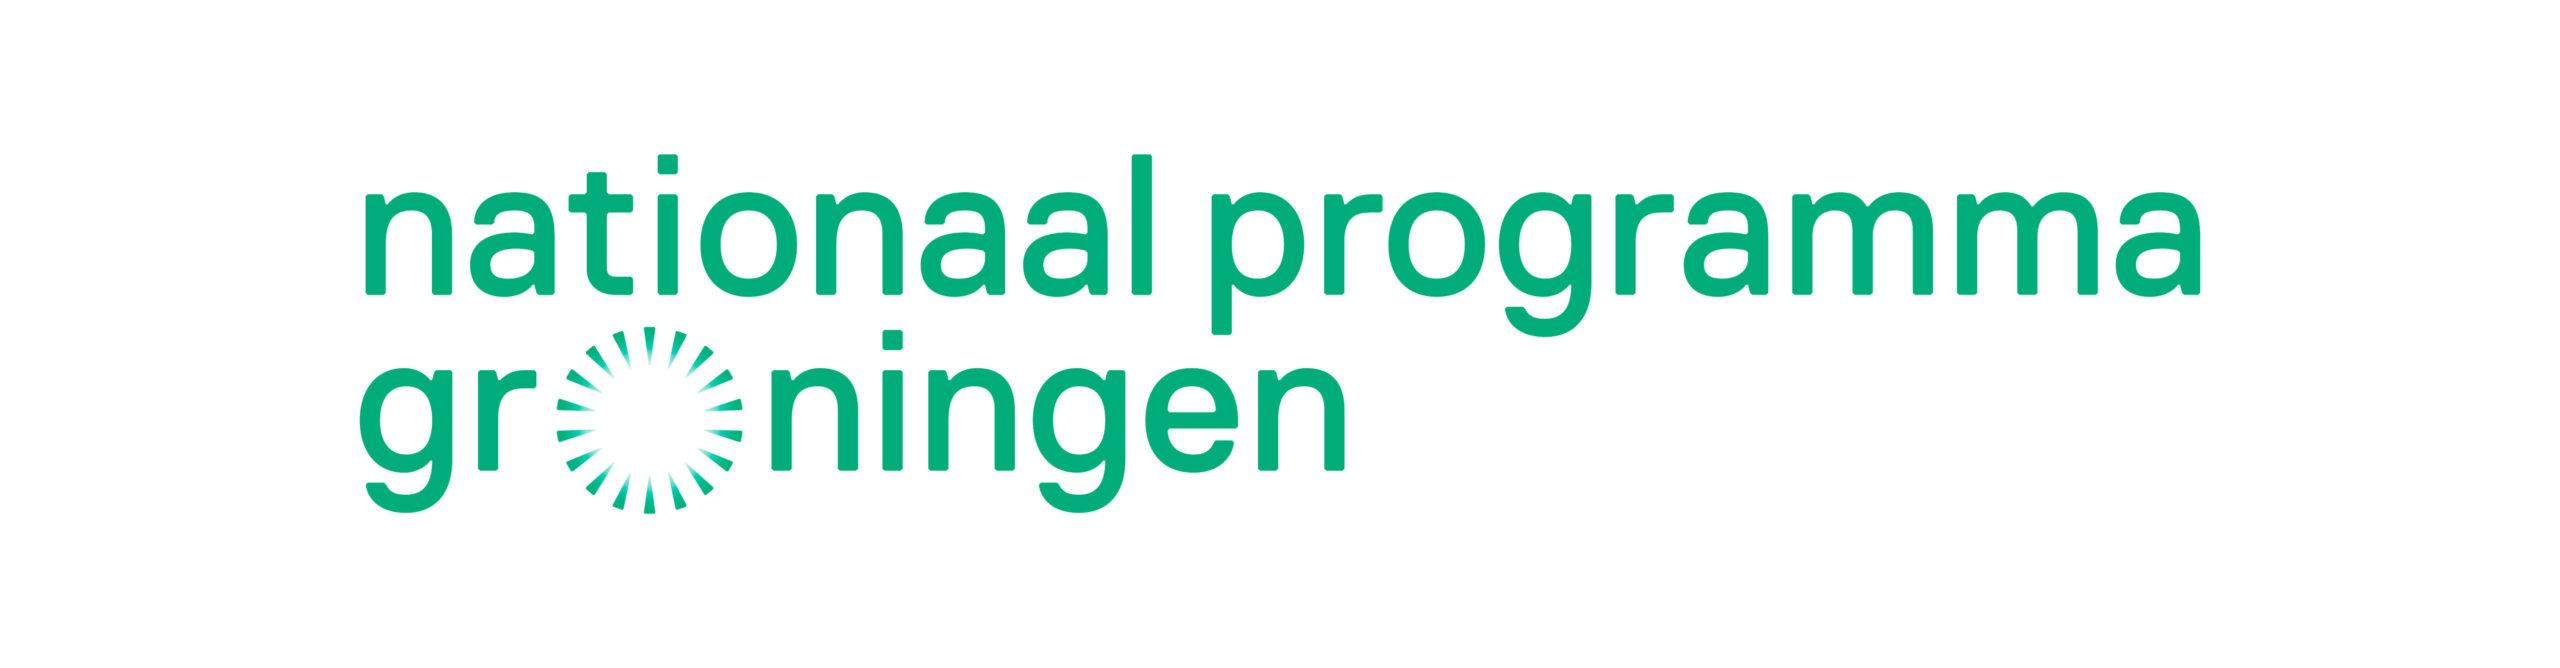 Nationaal Programma Groningen